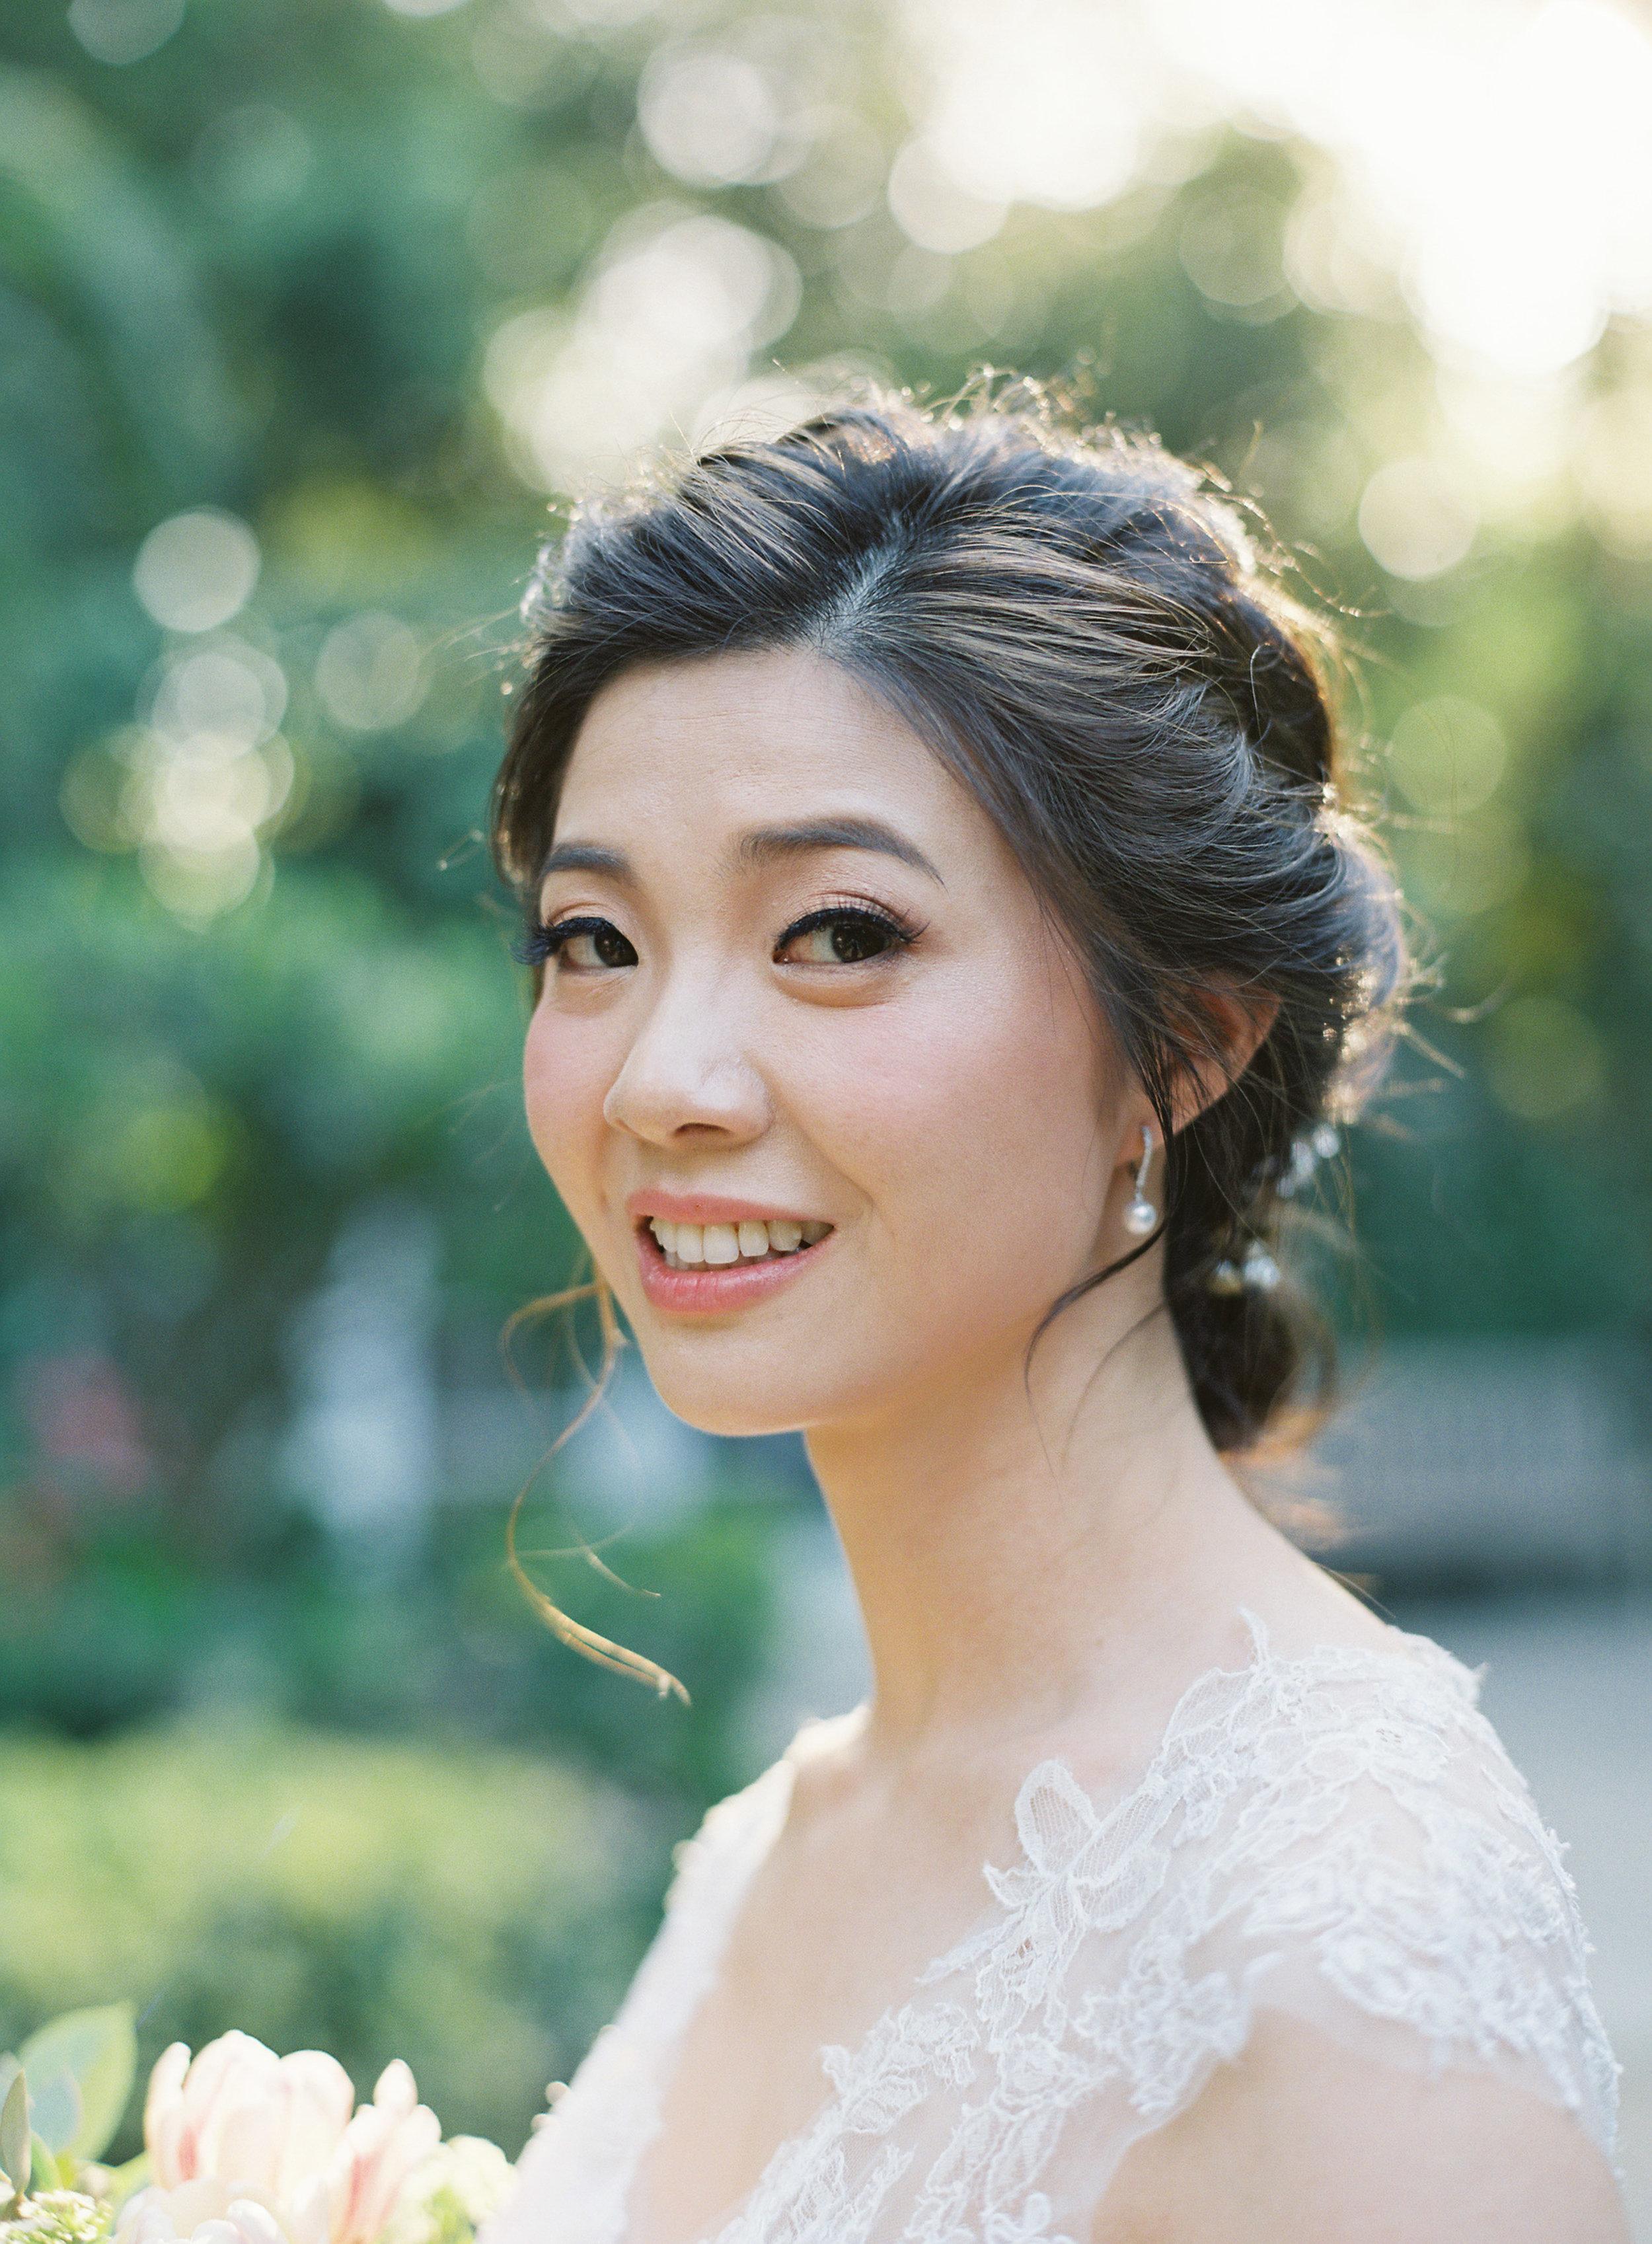 Jenn-Albert-Editorial-High-Res-42-Jen-Huang-007314-R1-015.jpg